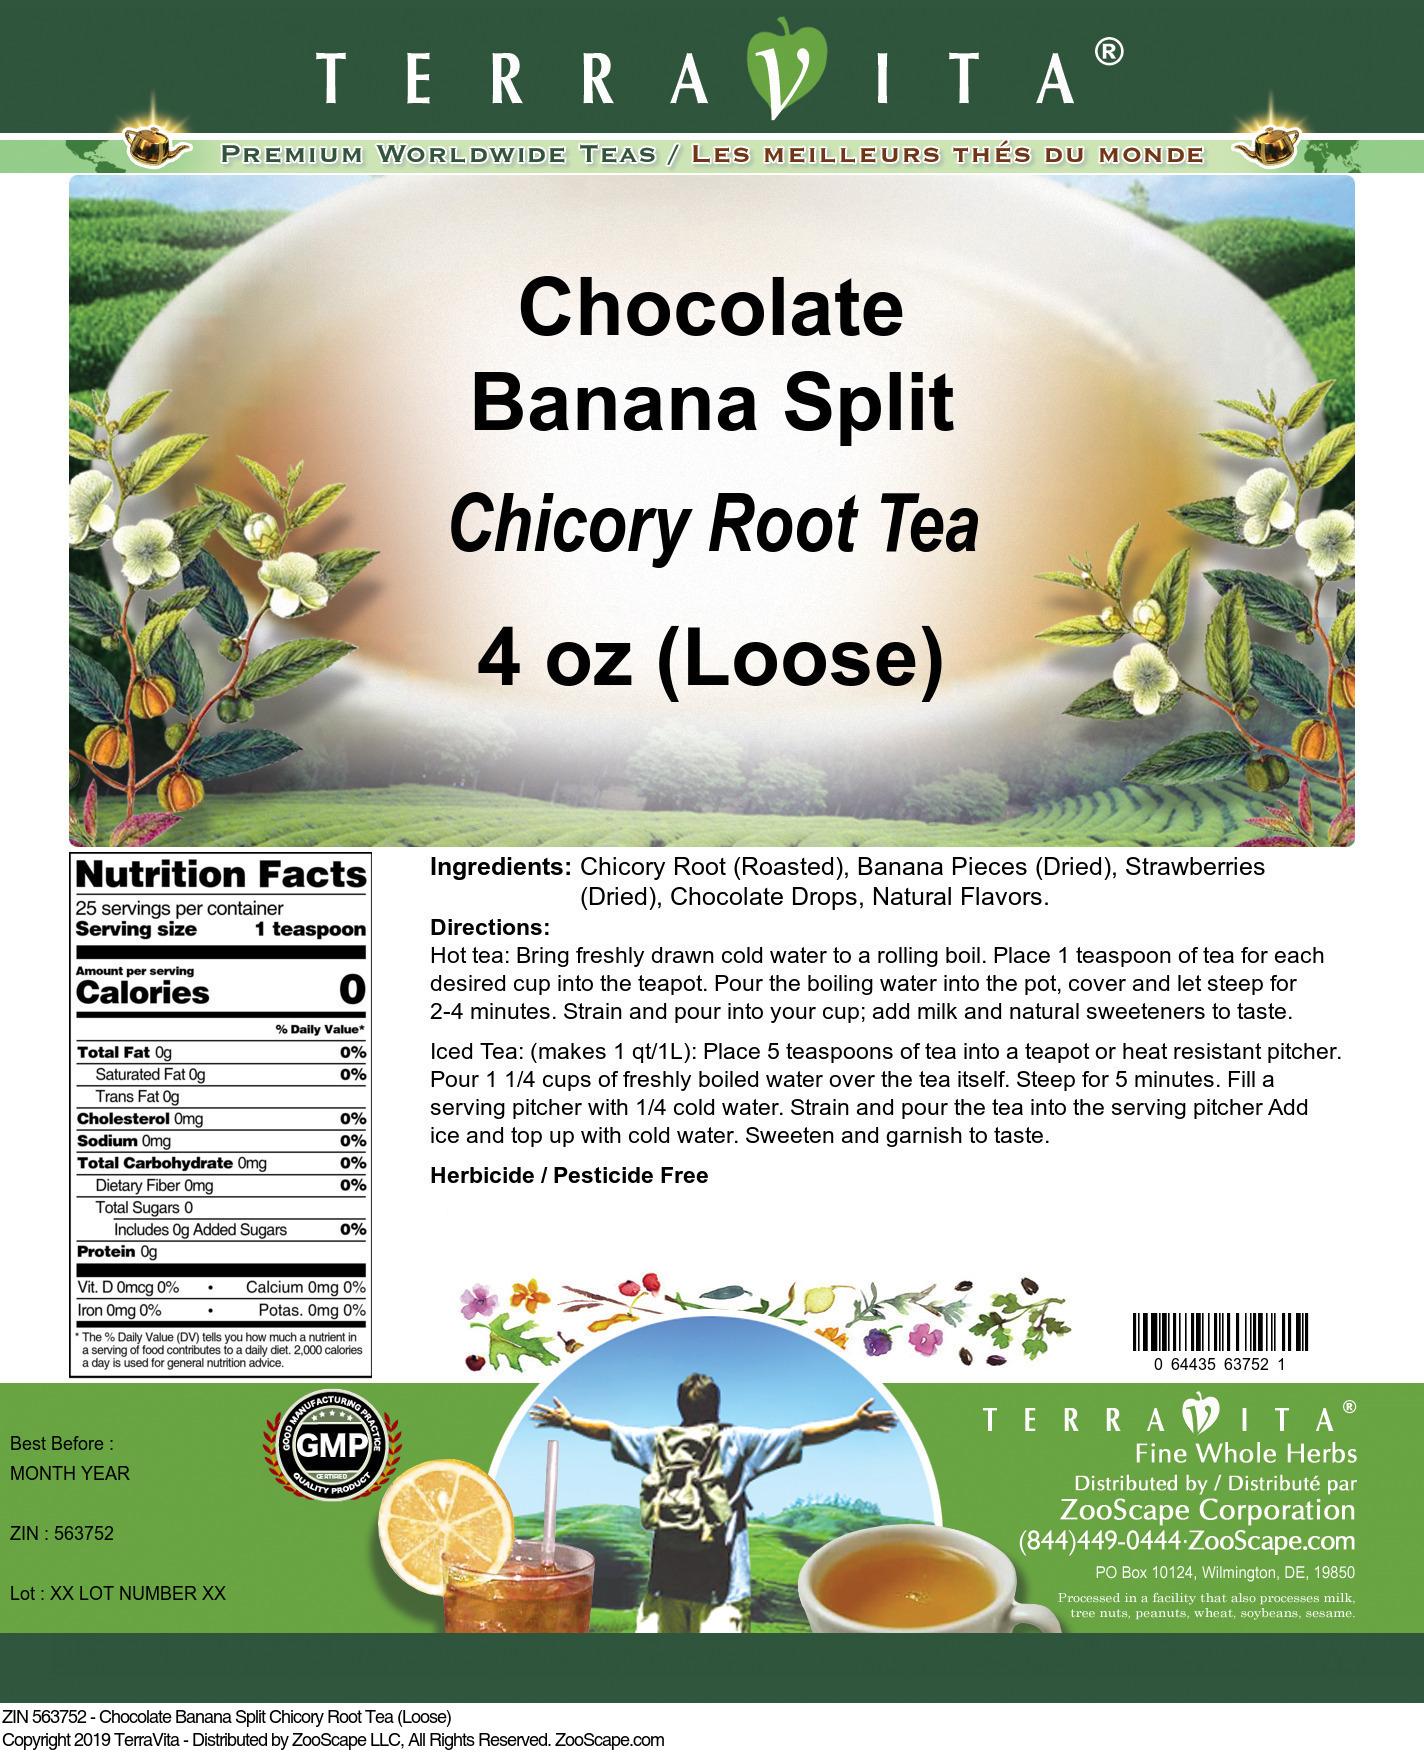 Chocolate Banana Split Chicory Root Tea (Loose)